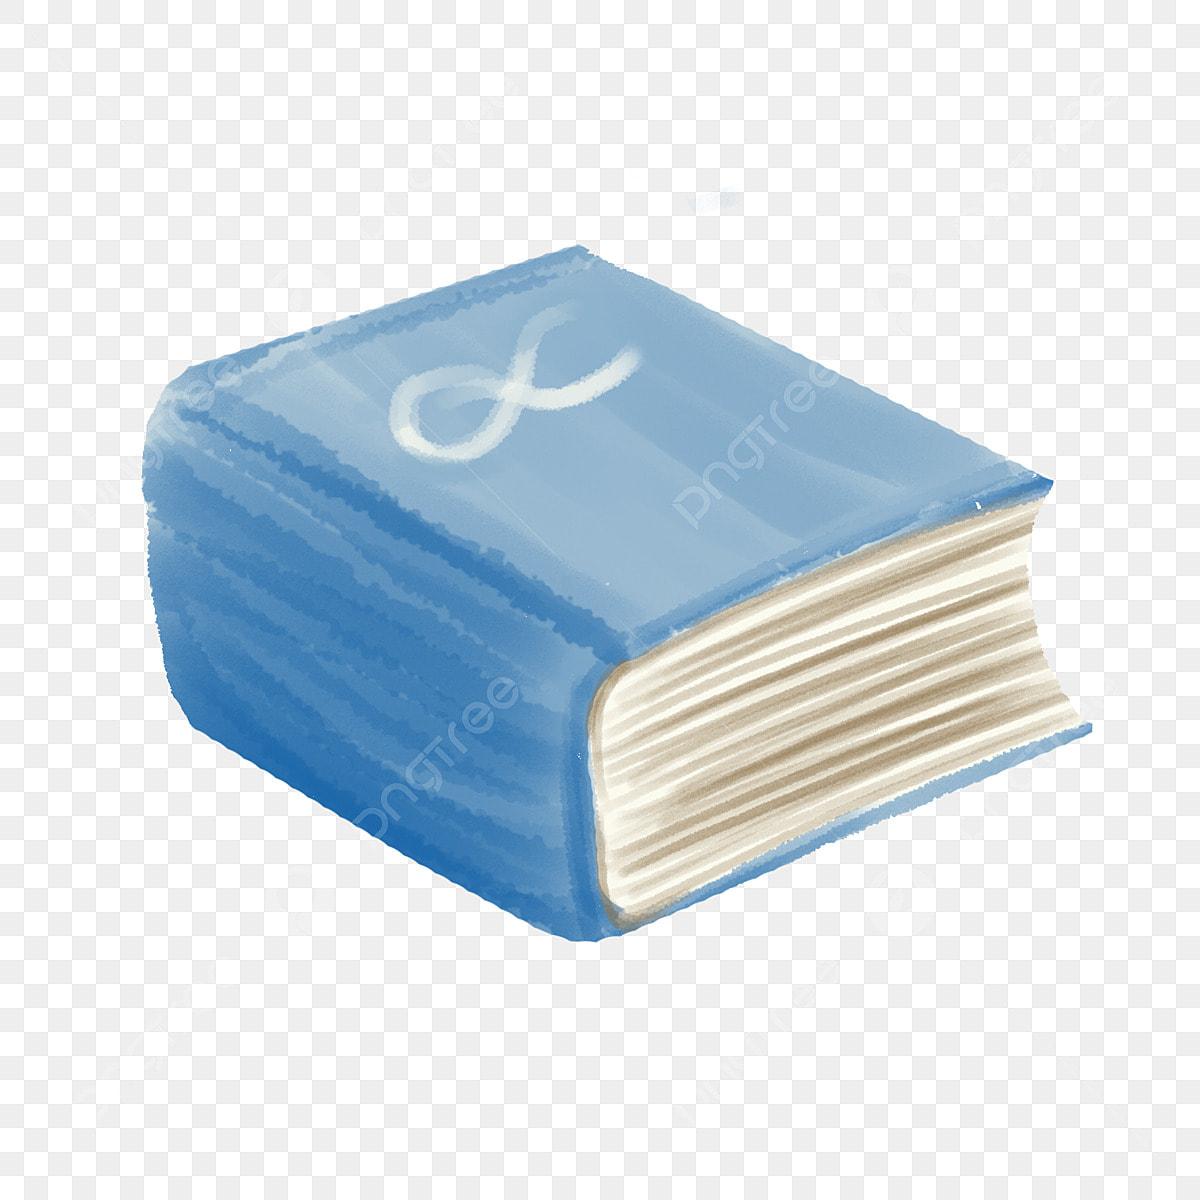 Stereo Livre Bleu Illustration Livre Epais Bleu Education